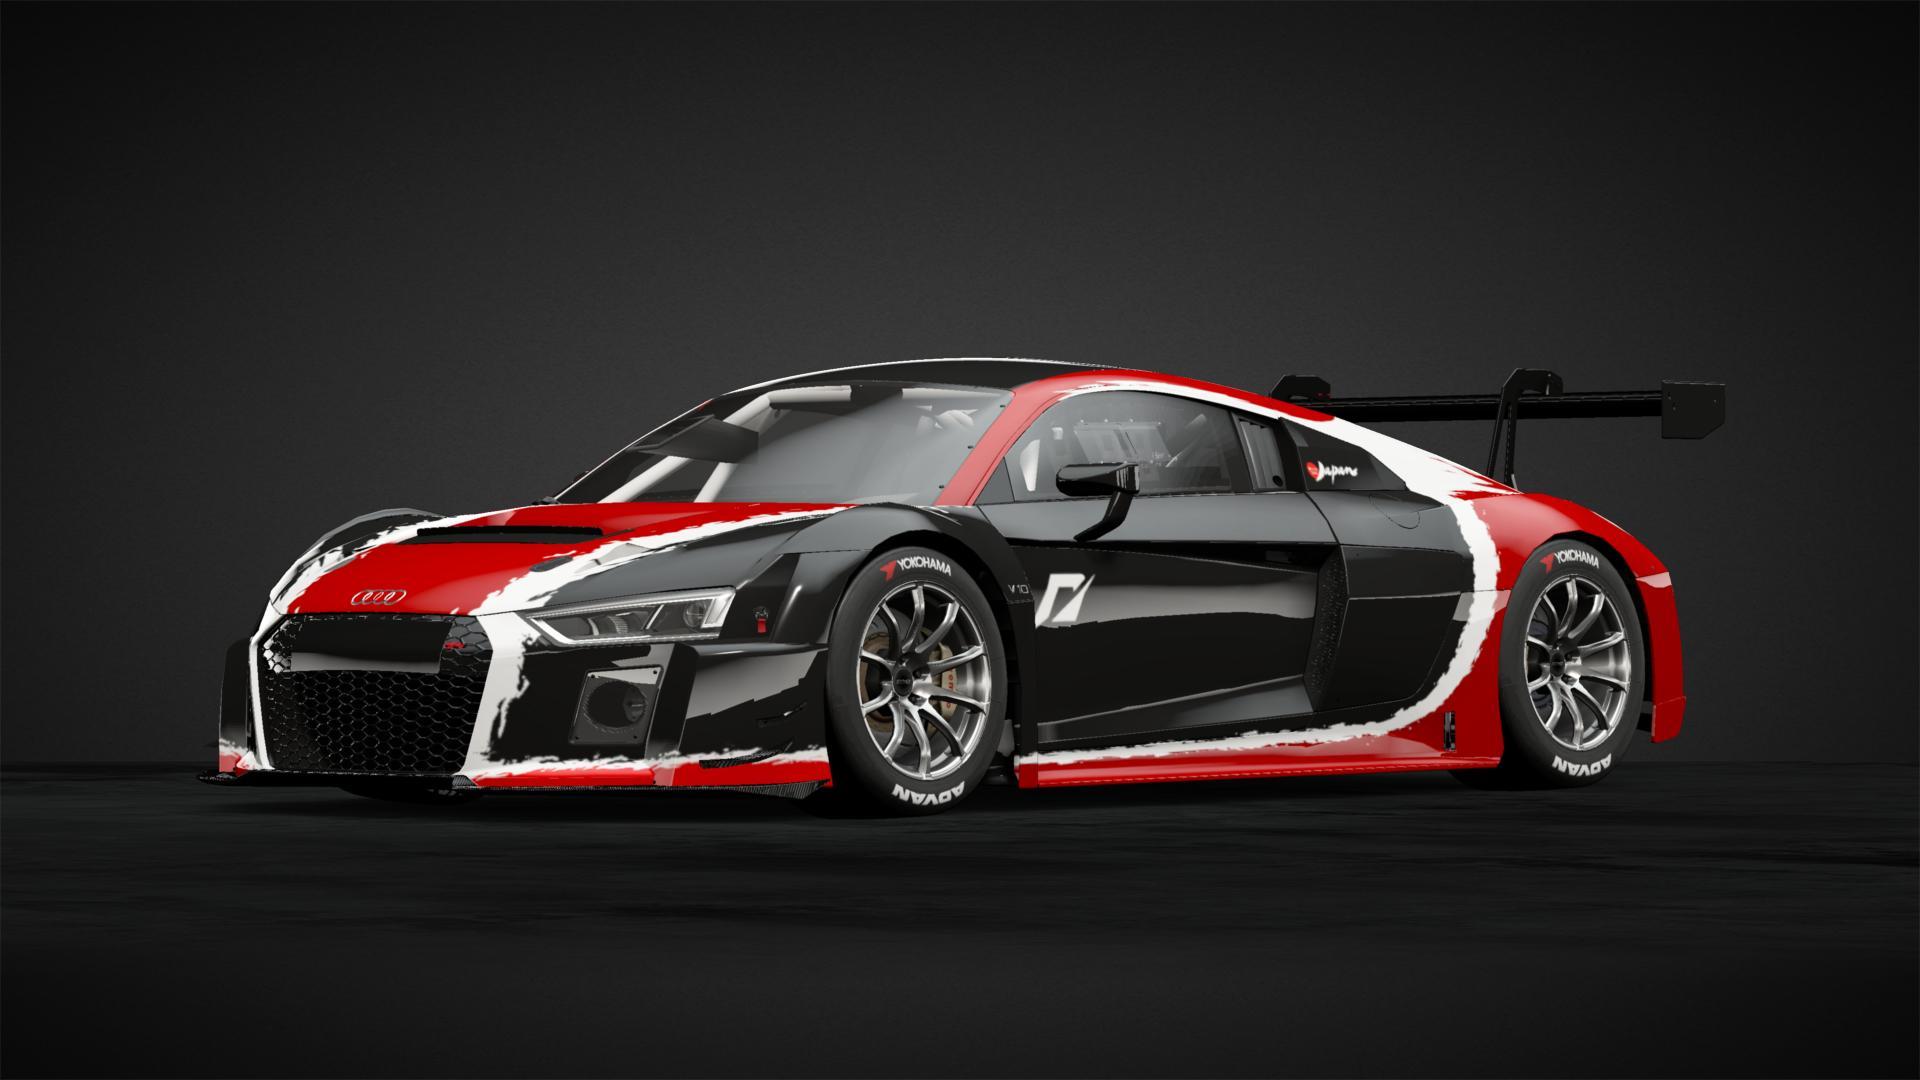 R8 GT3 Darius NFS Carbon - Car Livery by HernanLucena203